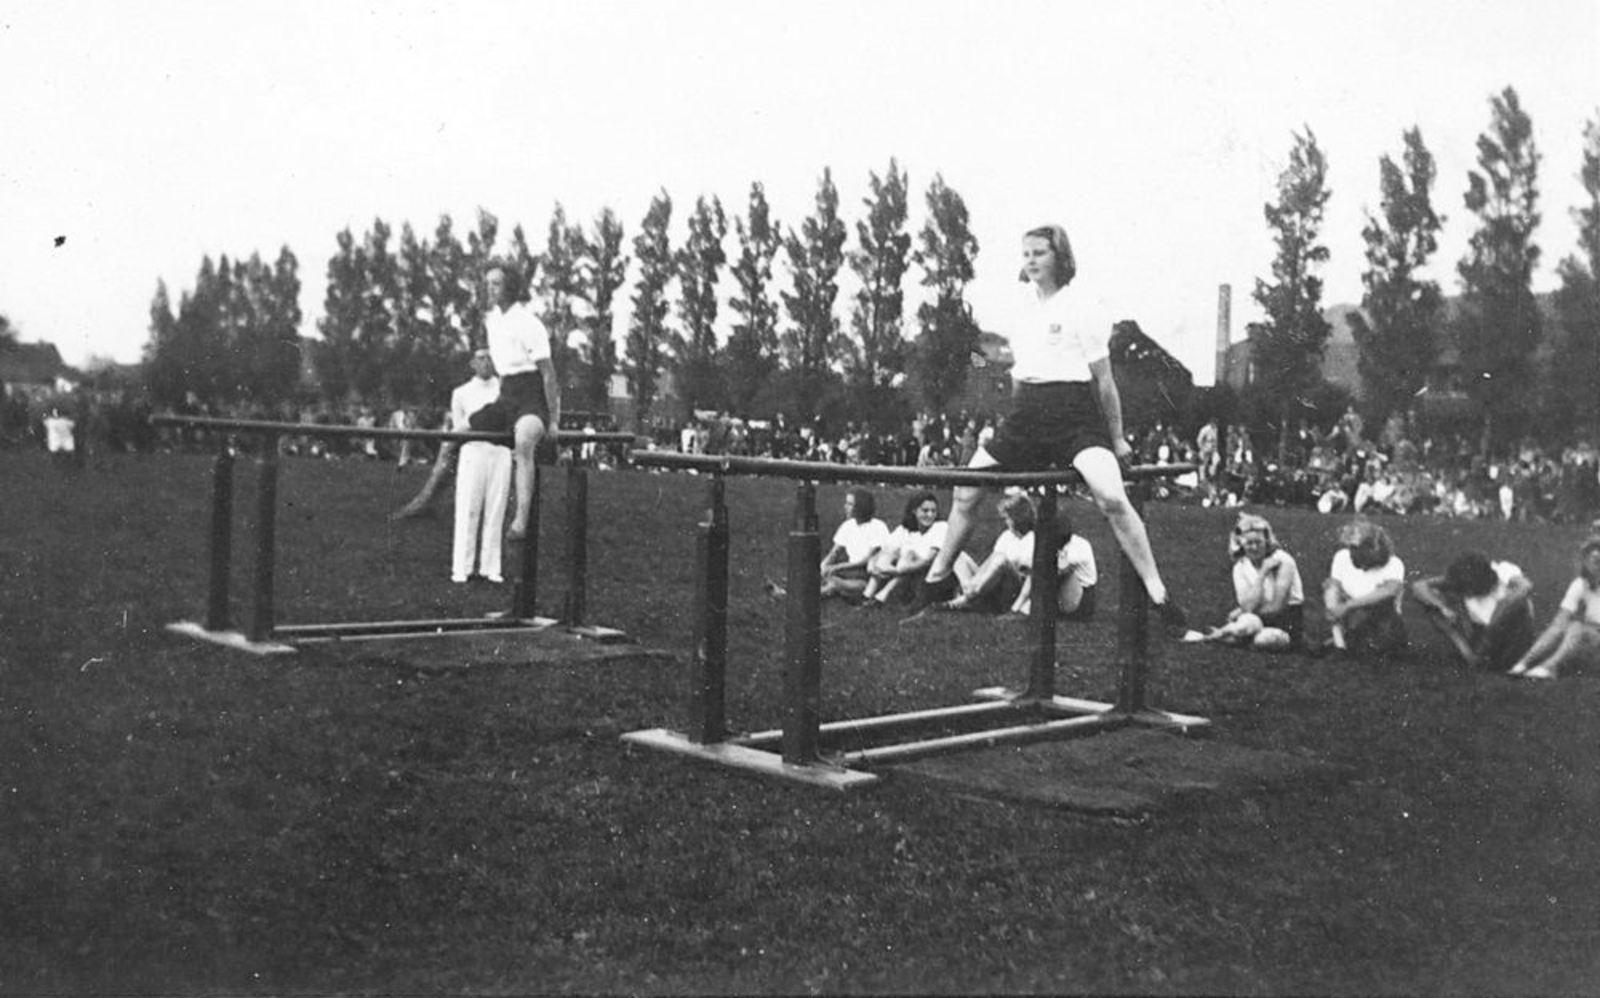 Gym en Athletiek Ver Hoofddorp 1960± Springgroep Adspiranten